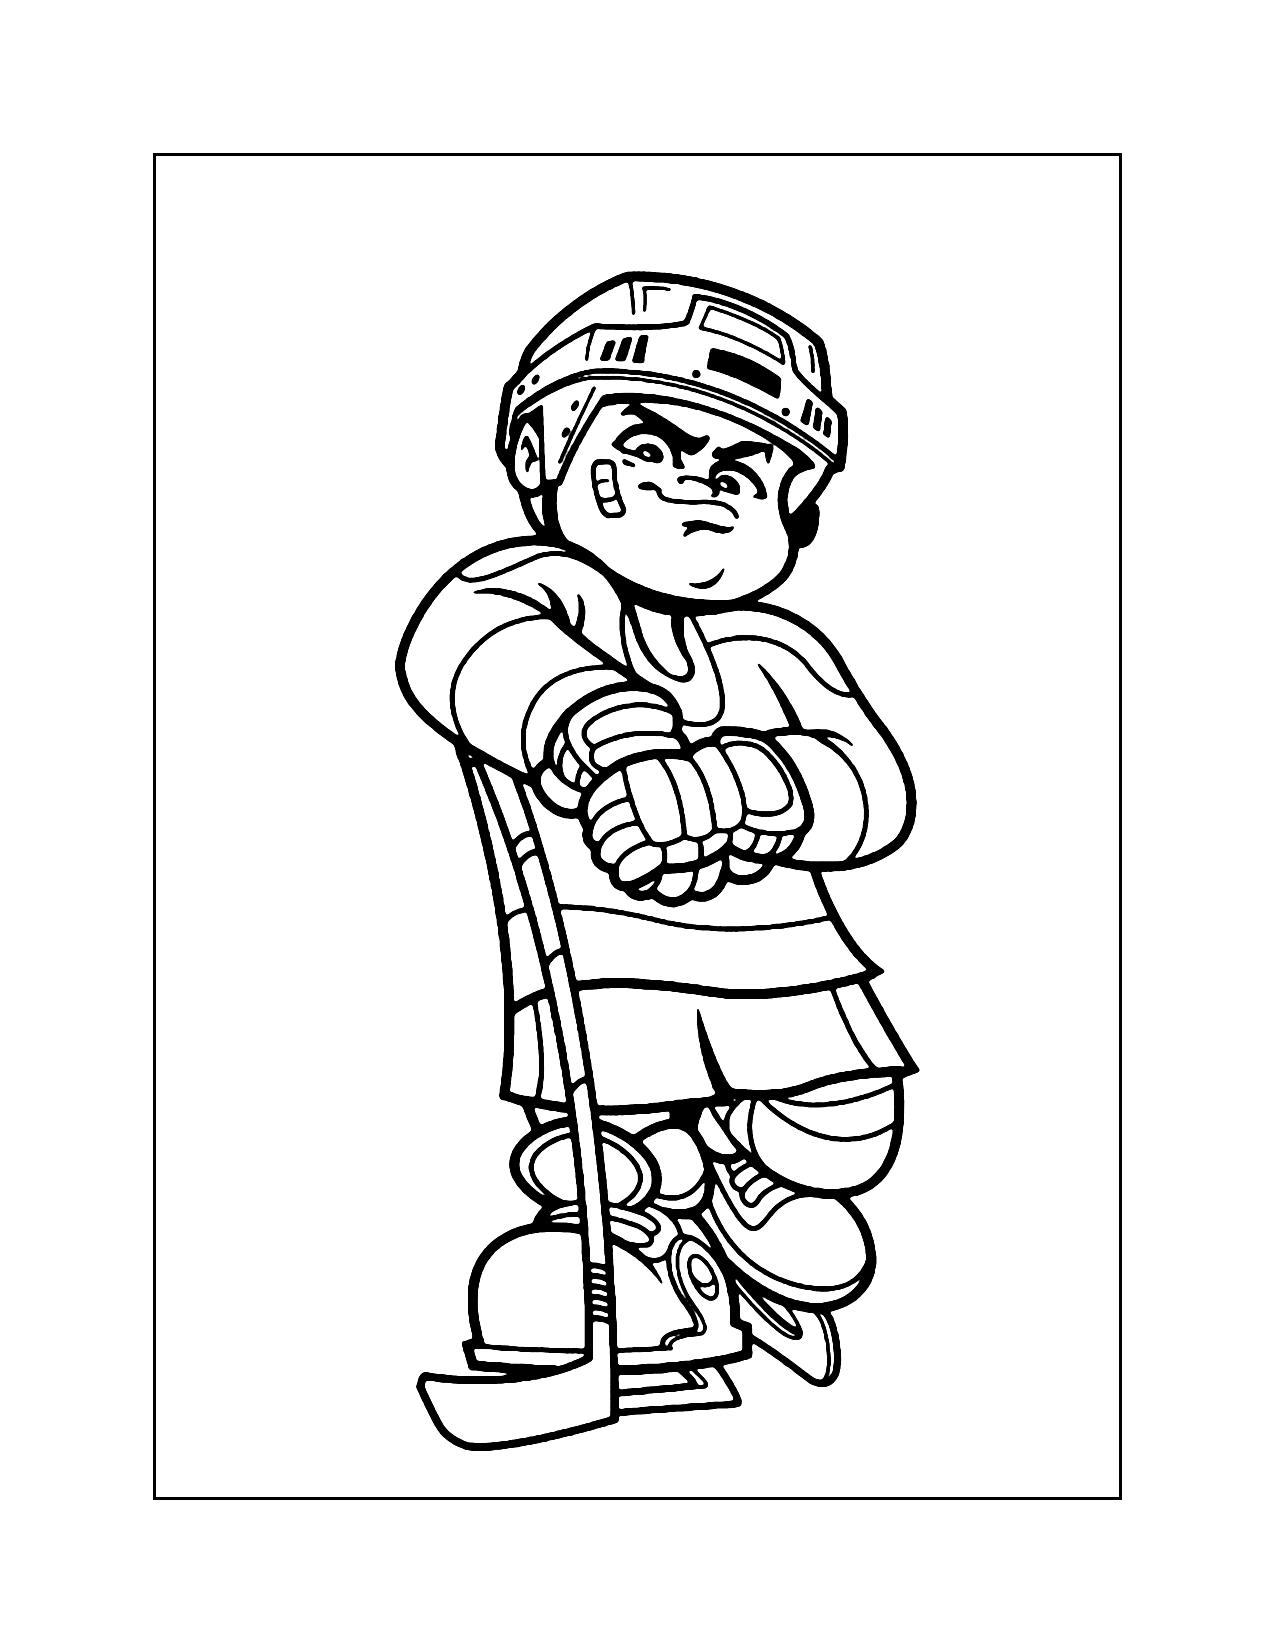 Cool Cartoon Hockey Kid Coloring Page